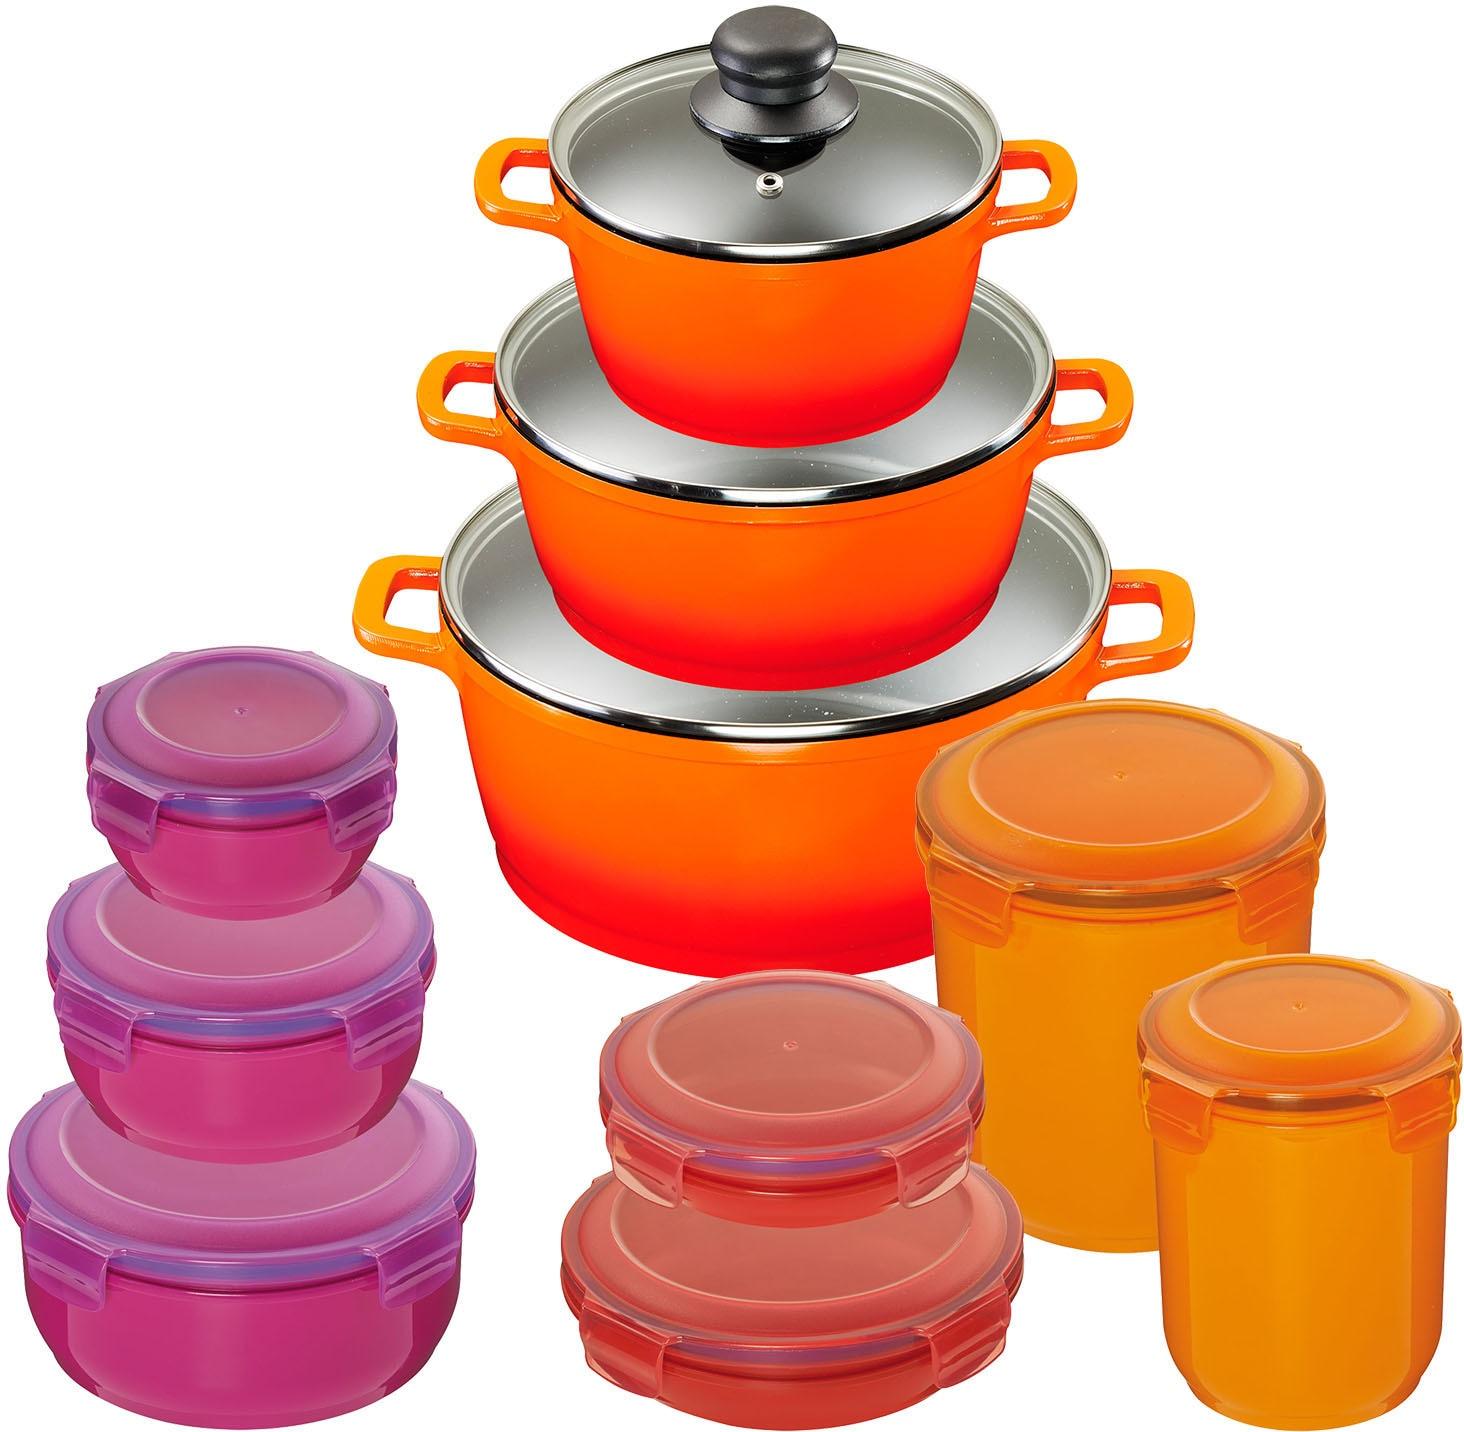 KING Topf-Set Orange (Set, 10-tlg., 3 Töpfe, Deckel, 7 Dosen) orange Topfsets Töpfe Haushaltswaren Topf